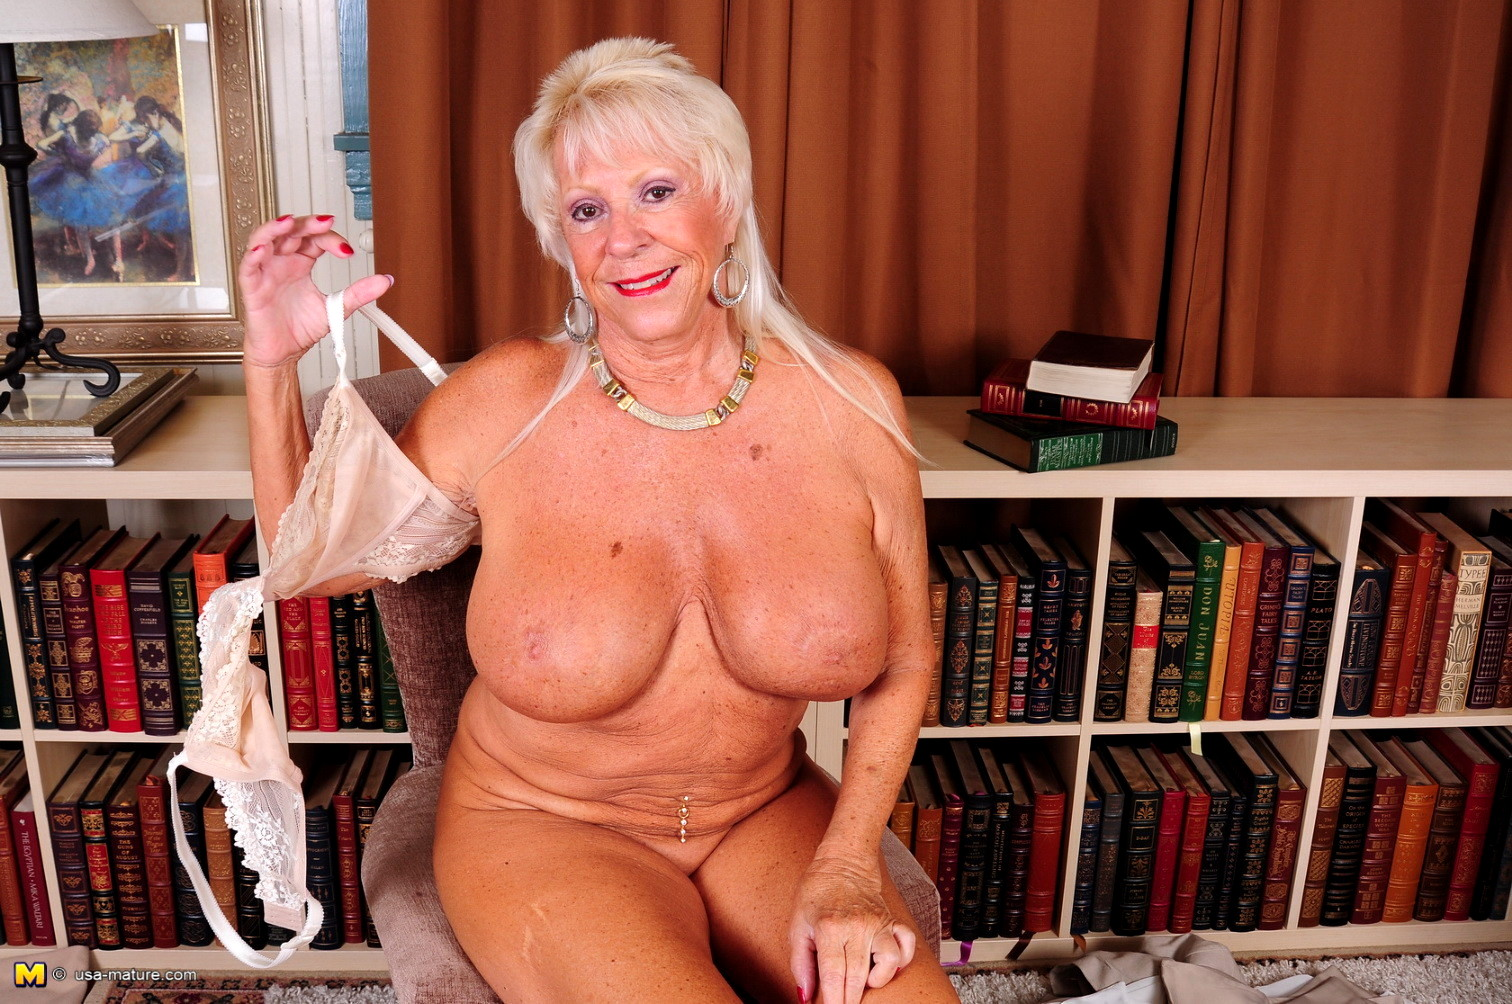 Babe Today Mature Nl Mandi Mcgraw Crazy Big Tits Xxxart -7184